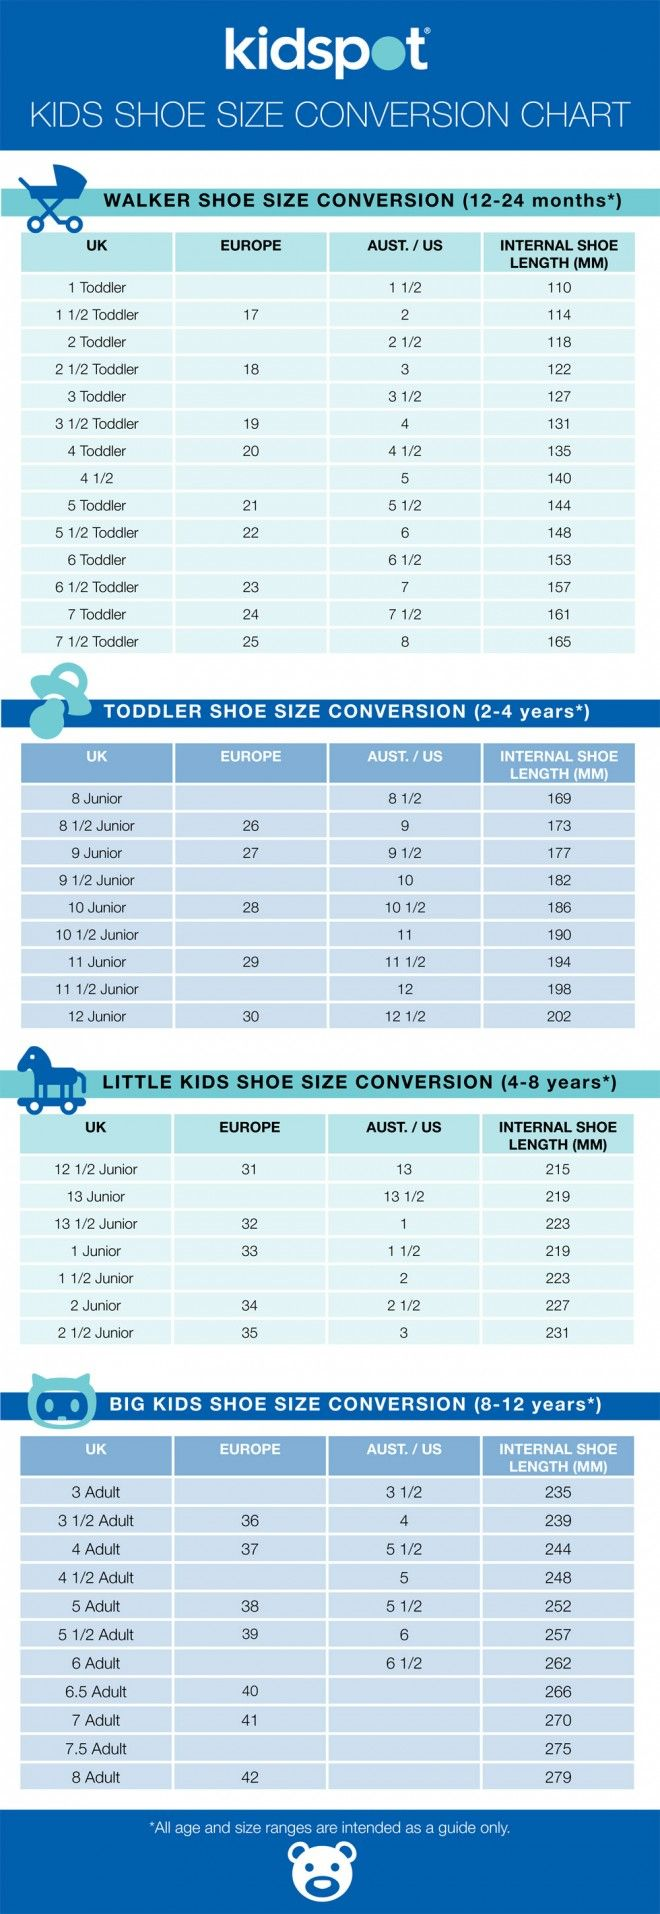 Kids shoe size conversion chart kids childcare pinterest kids shoe size conversion chart nvjuhfo Images